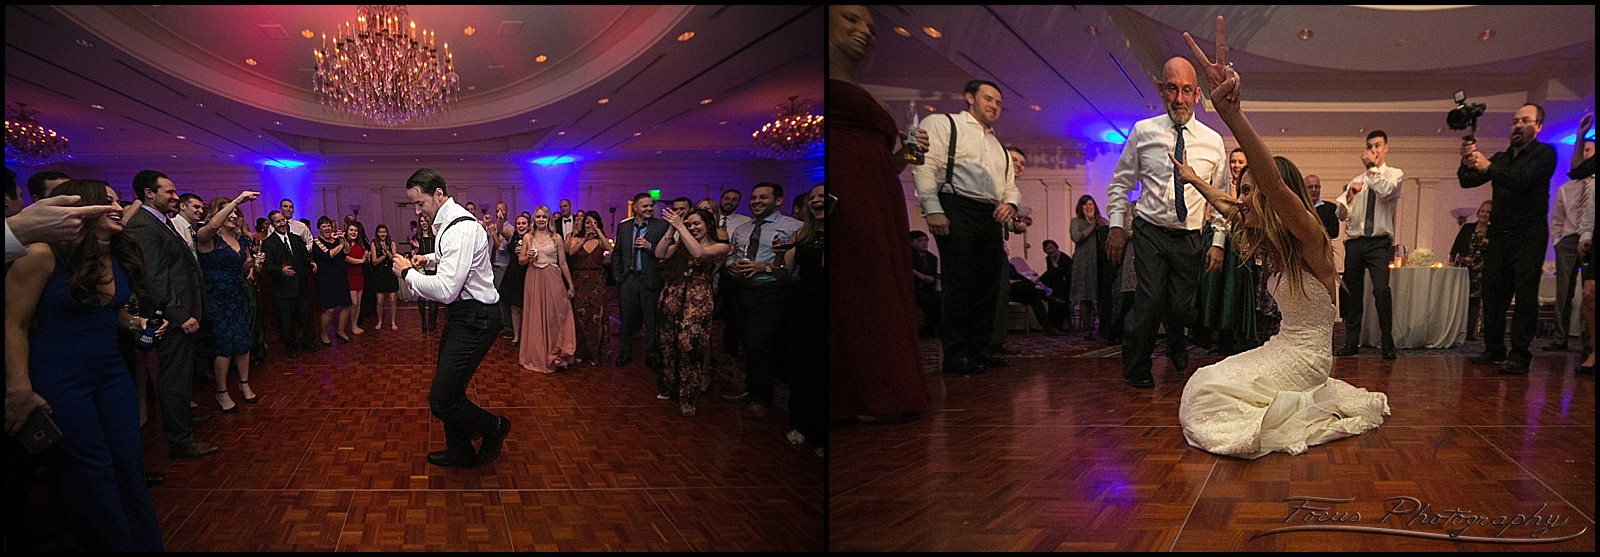 wentworth wedding photography 27